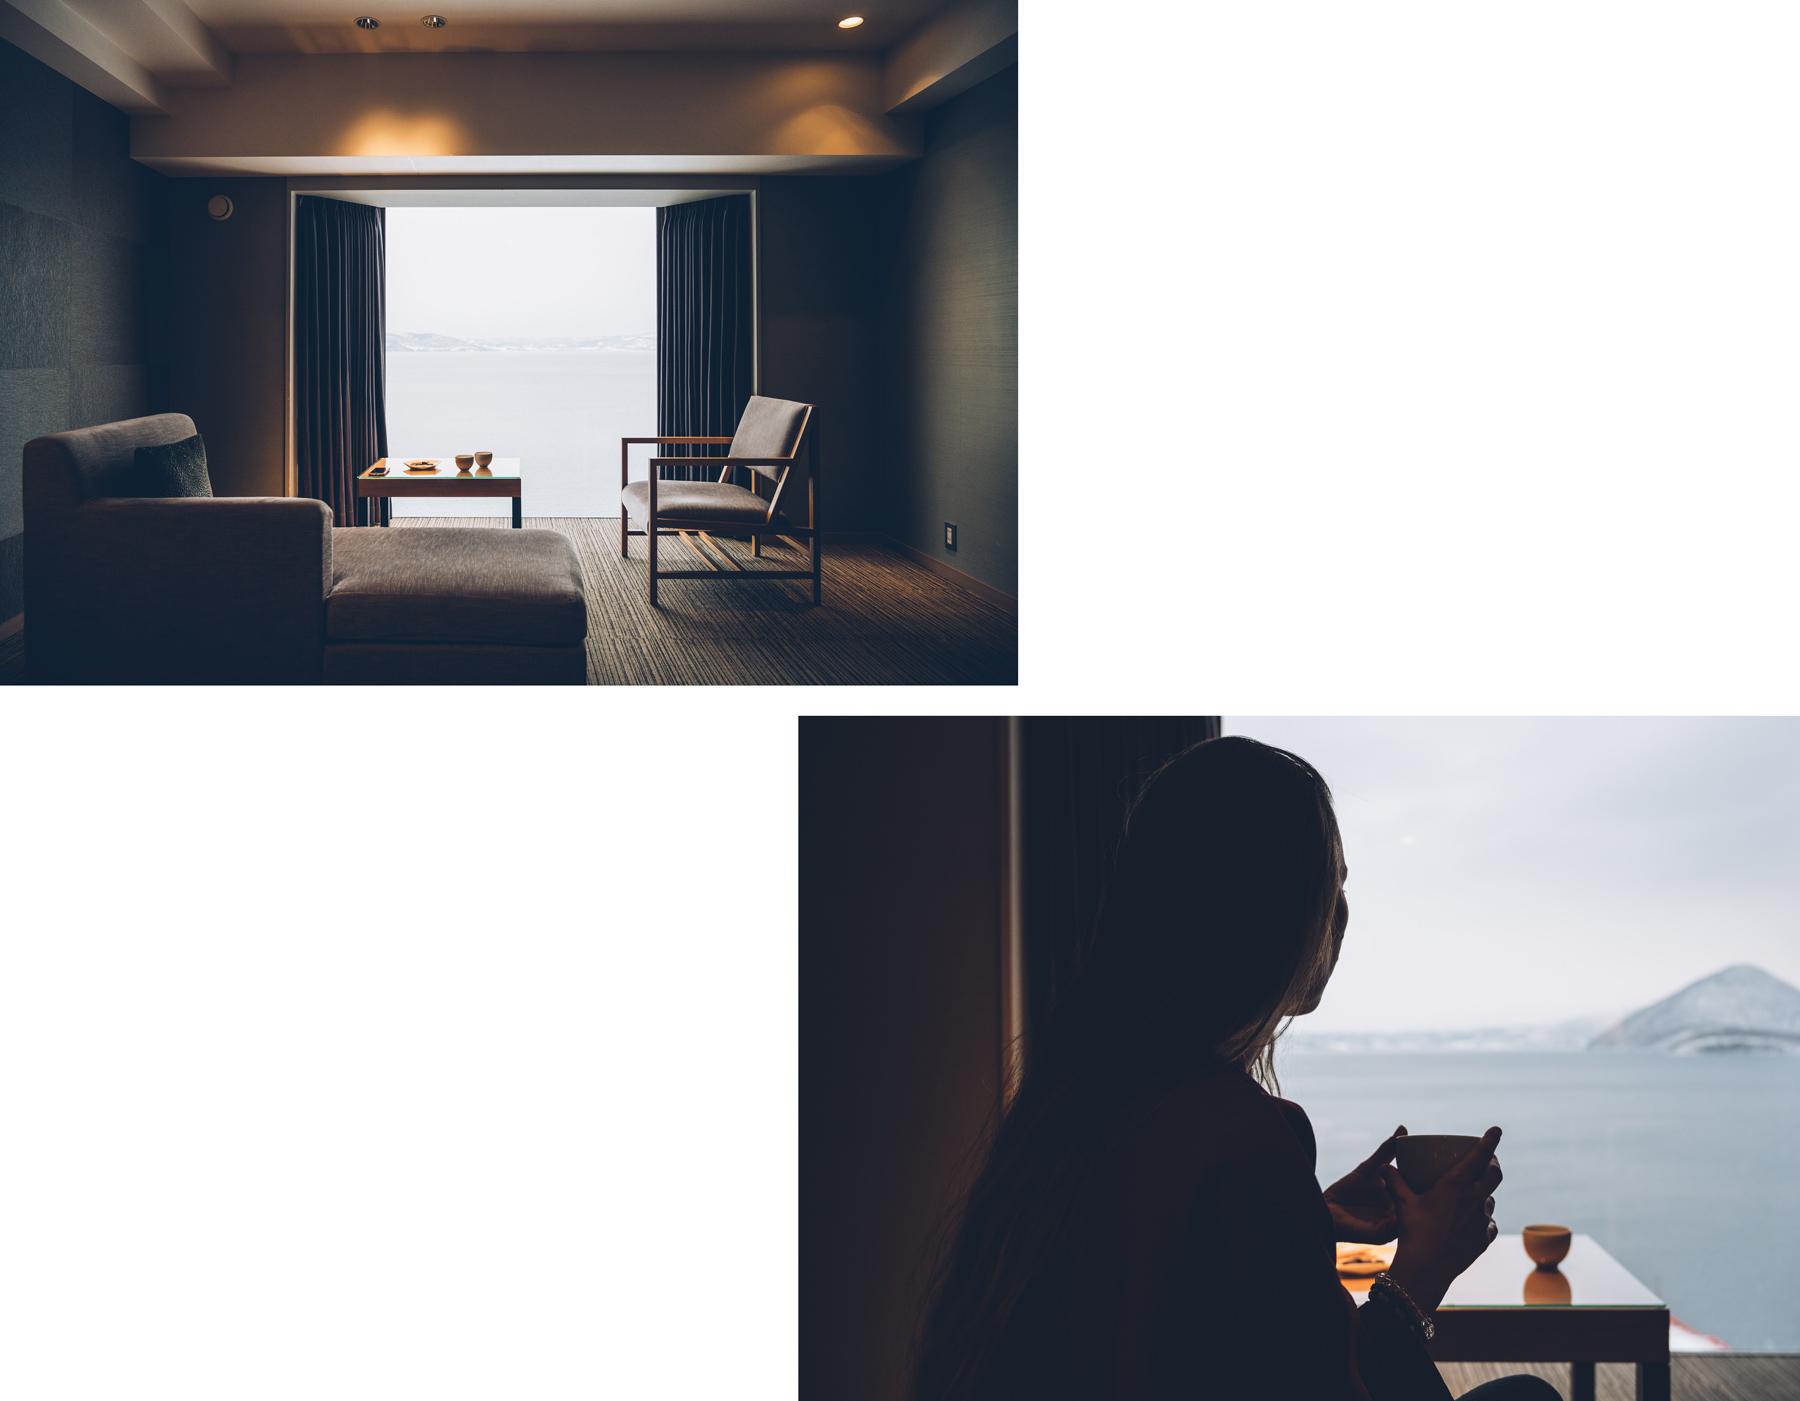 Nonokaze resort, Lake Toya, Hokkaido